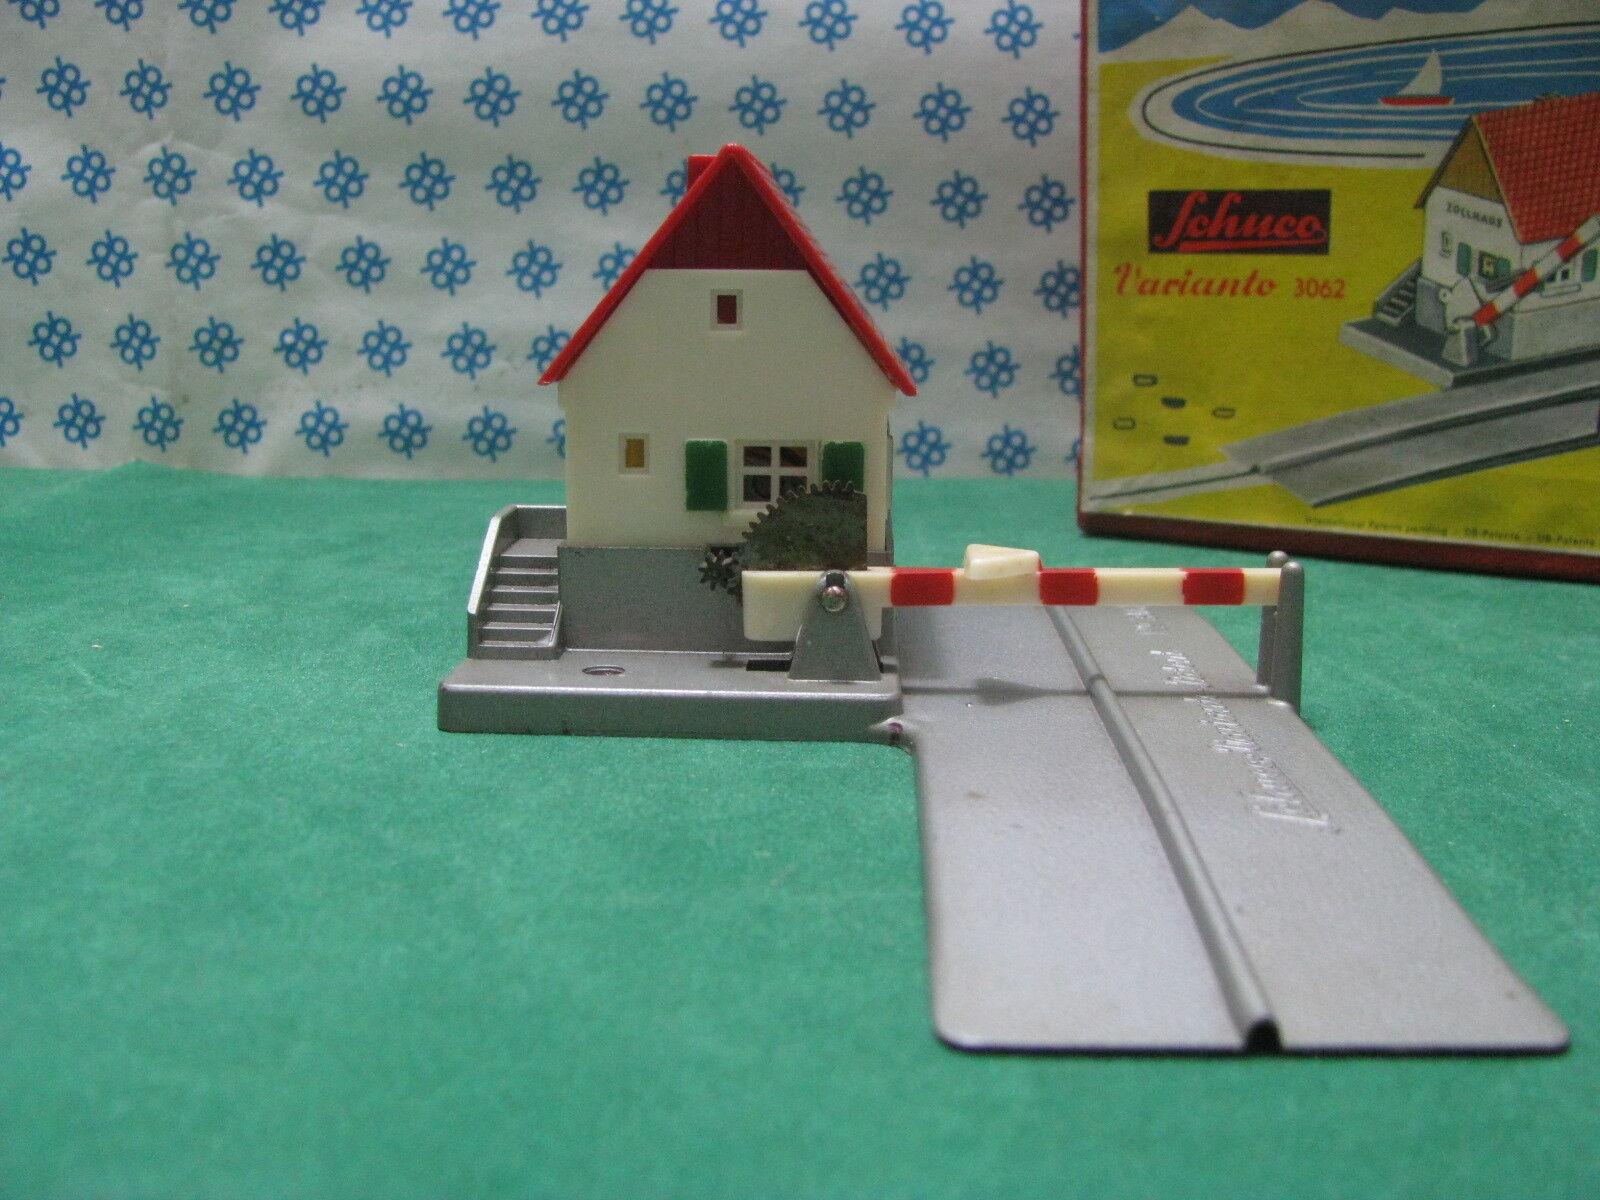 SCHUCO VARIANTO 3062 - Western Germany anni 50 - Mint